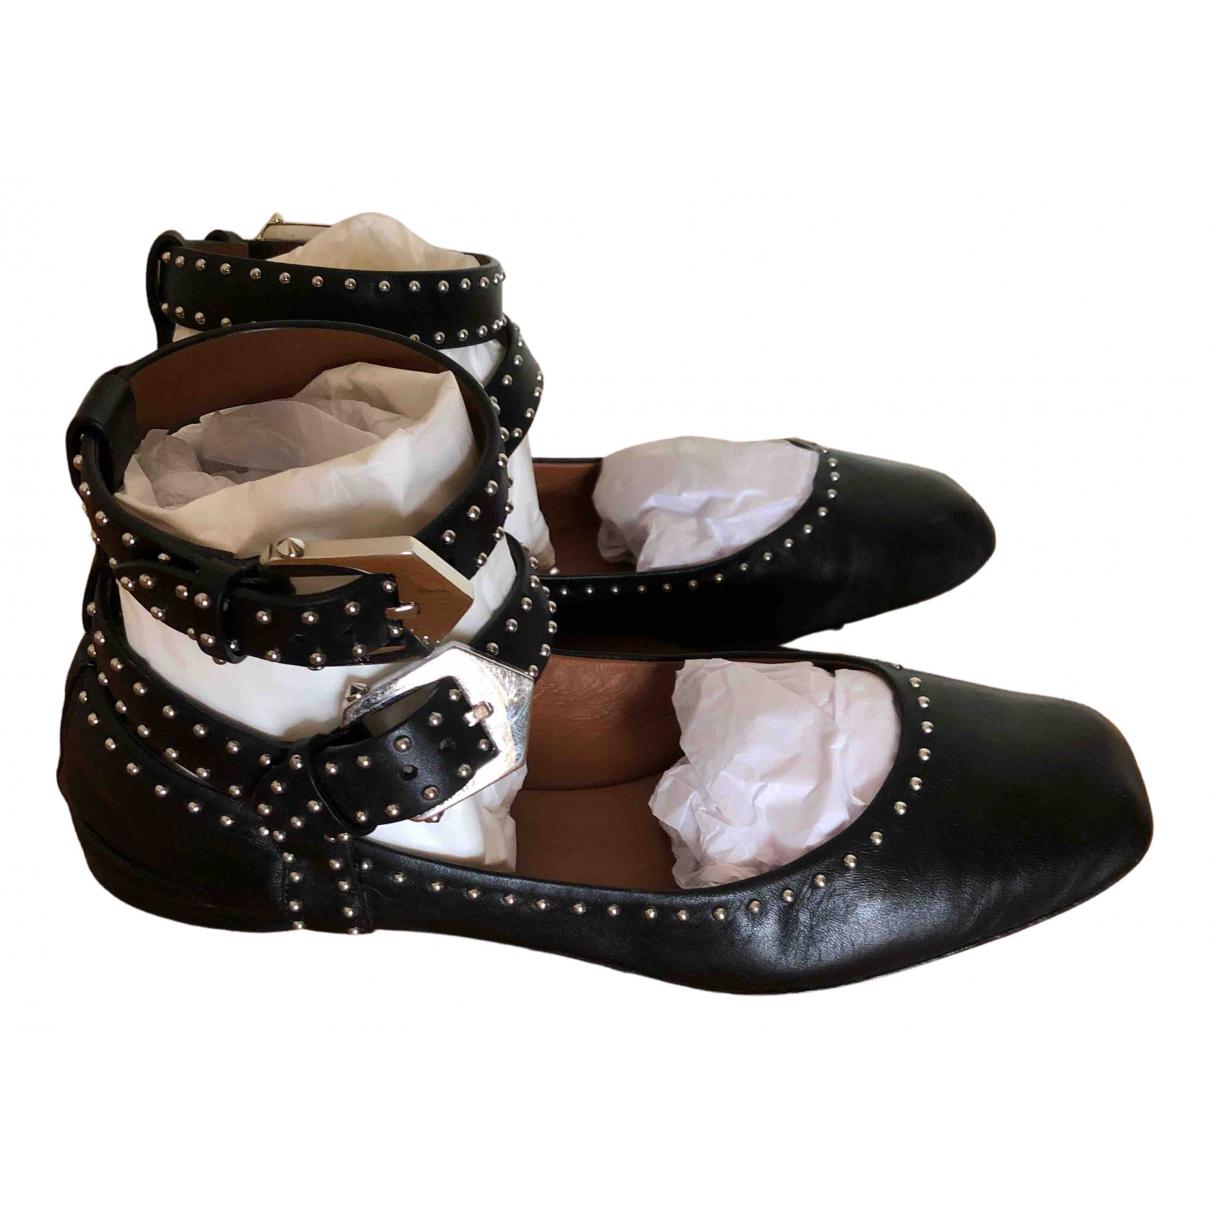 Givenchy \N Ballerinas in  Schwarz Leder